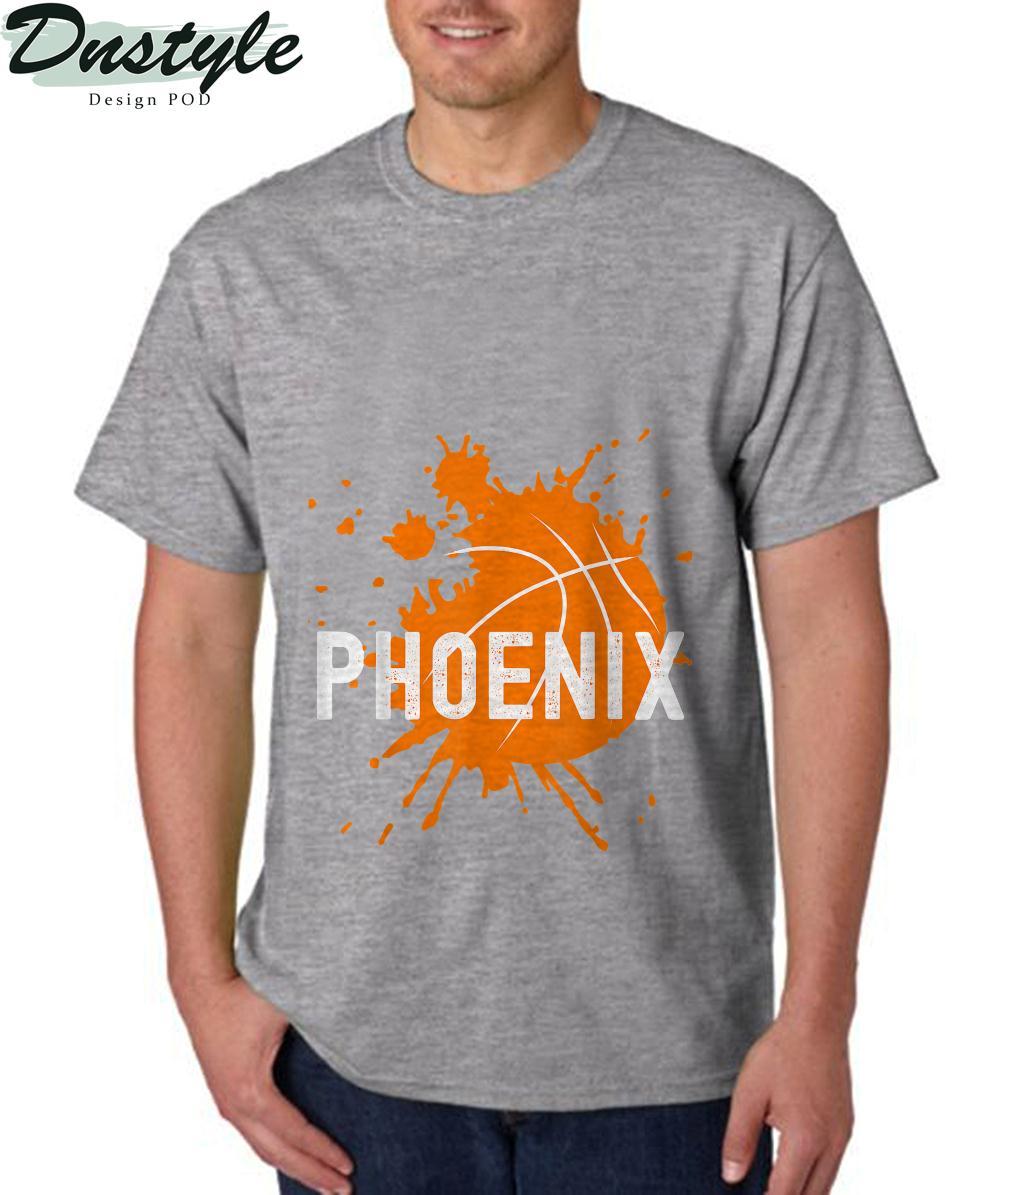 Phoenix Basketball B-Ball Valley PHX City Arizona State T-Shirt 1